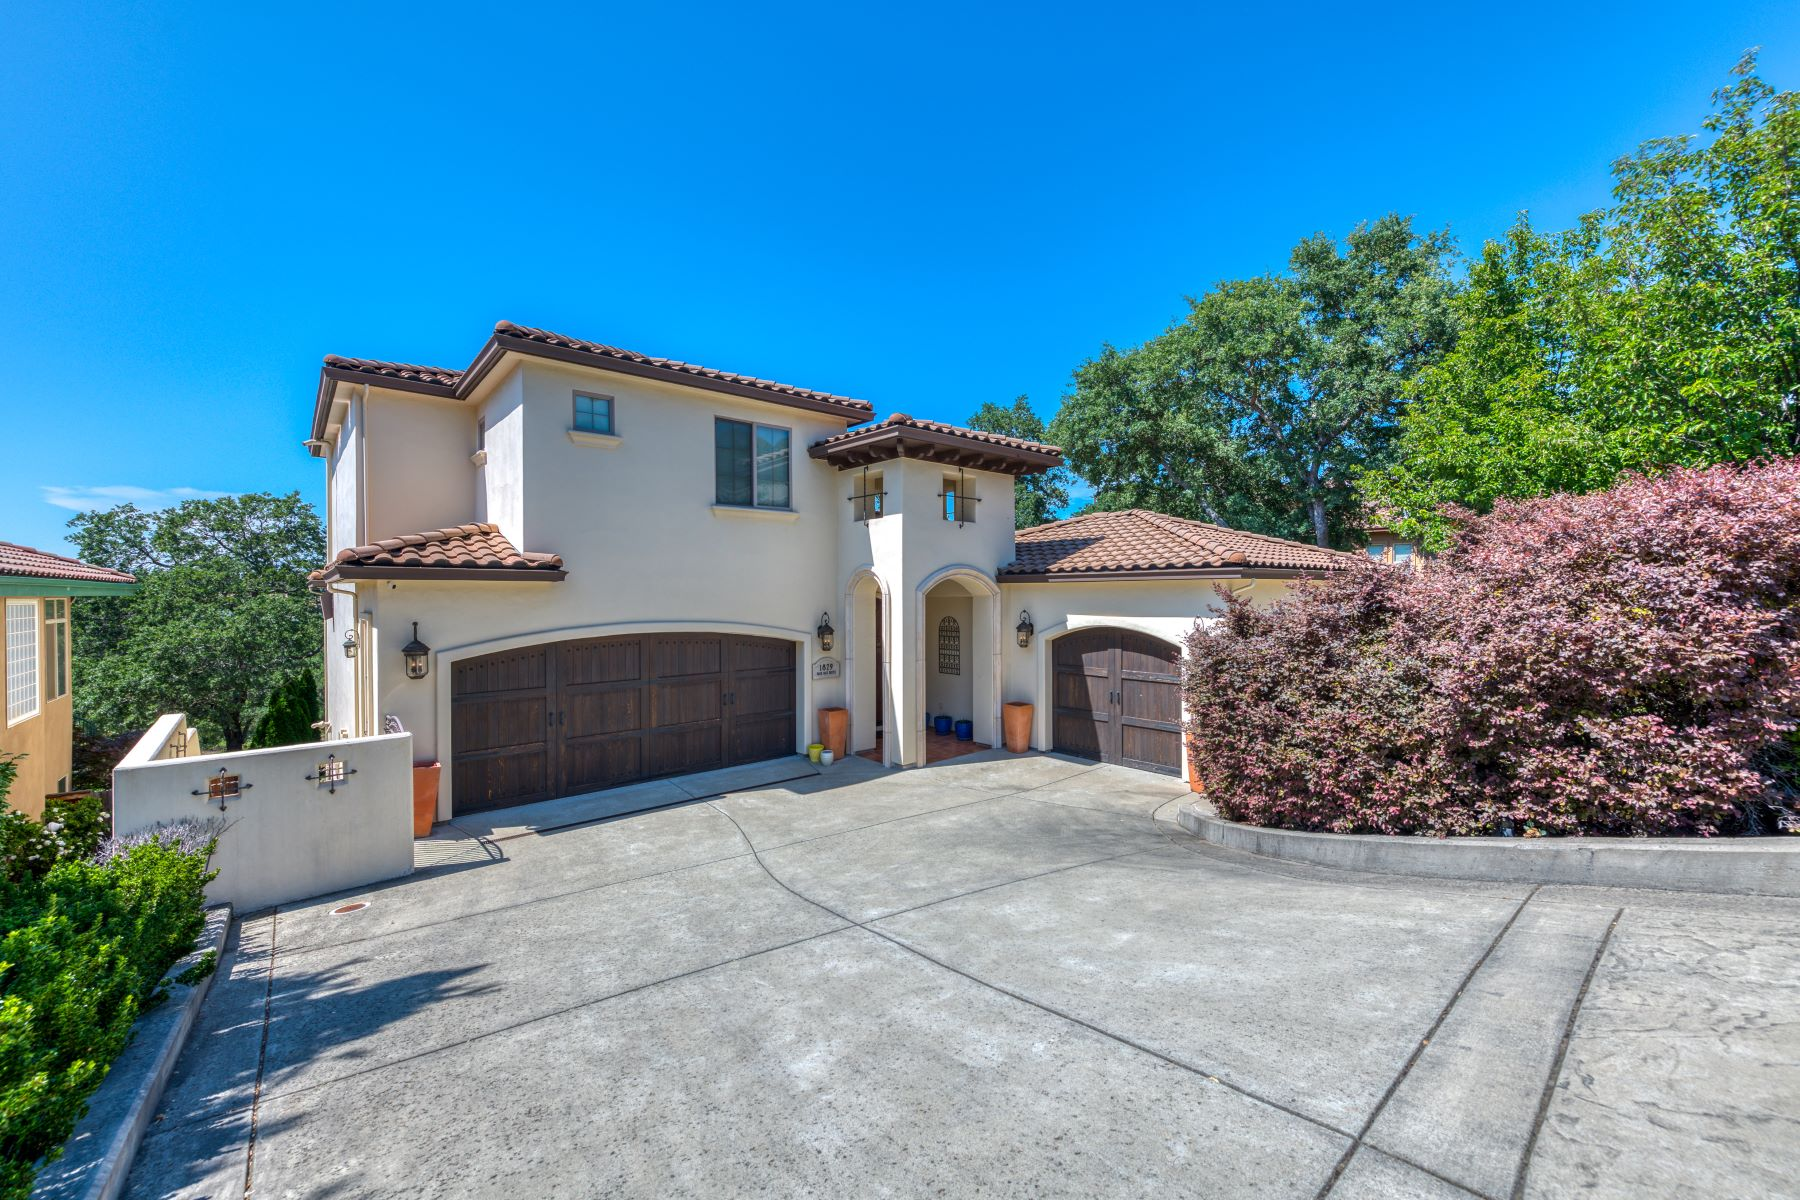 Single Family Homes por un Venta en 1829 Park Oak Dr, Roseville, CA 95661 1829 Park Oak Dr Roseville, California 95661 Estados Unidos